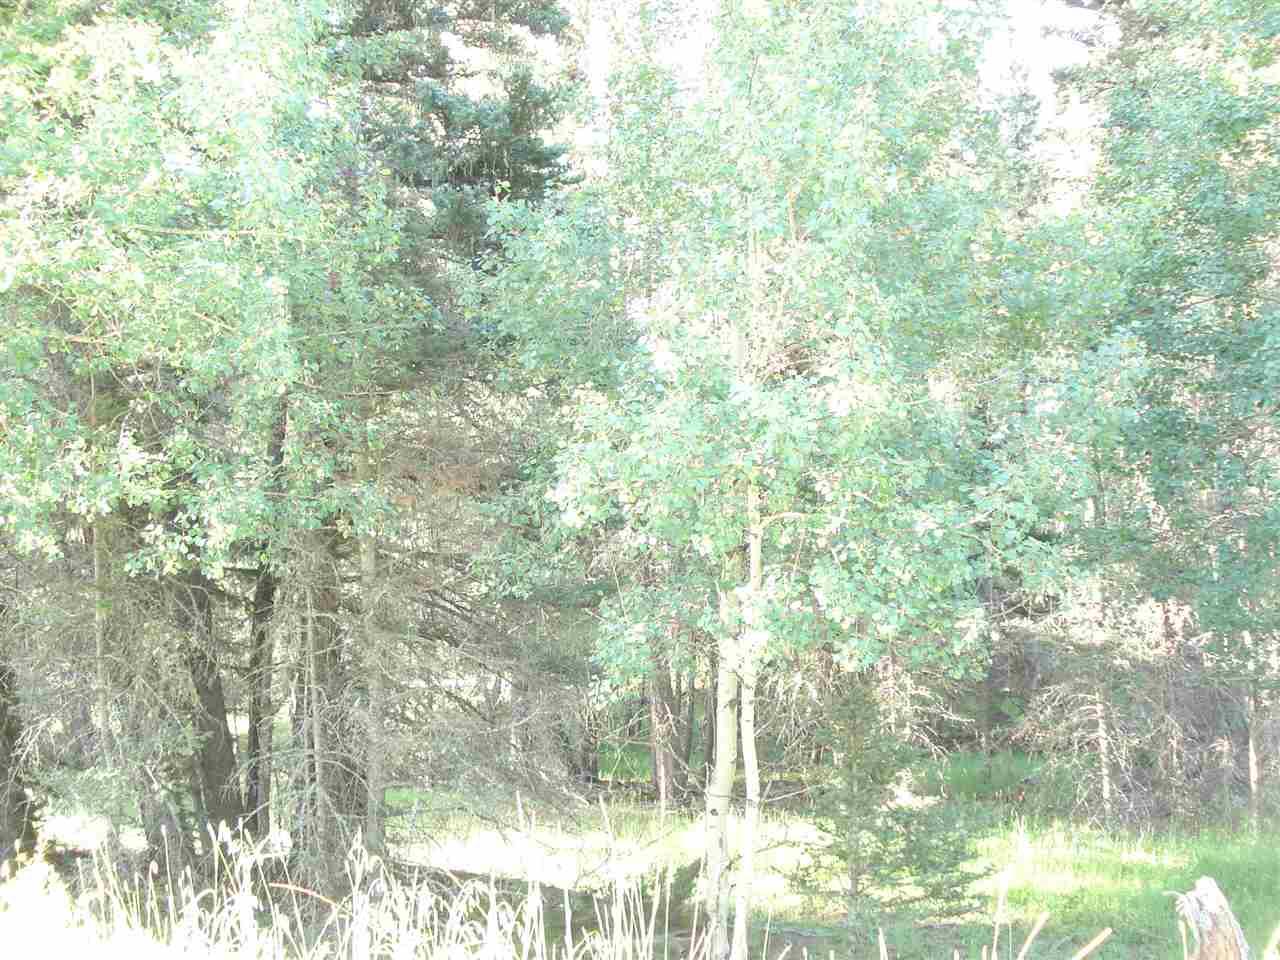 http://search.taosmls.net/taos_mls/images/97346-2.JPG